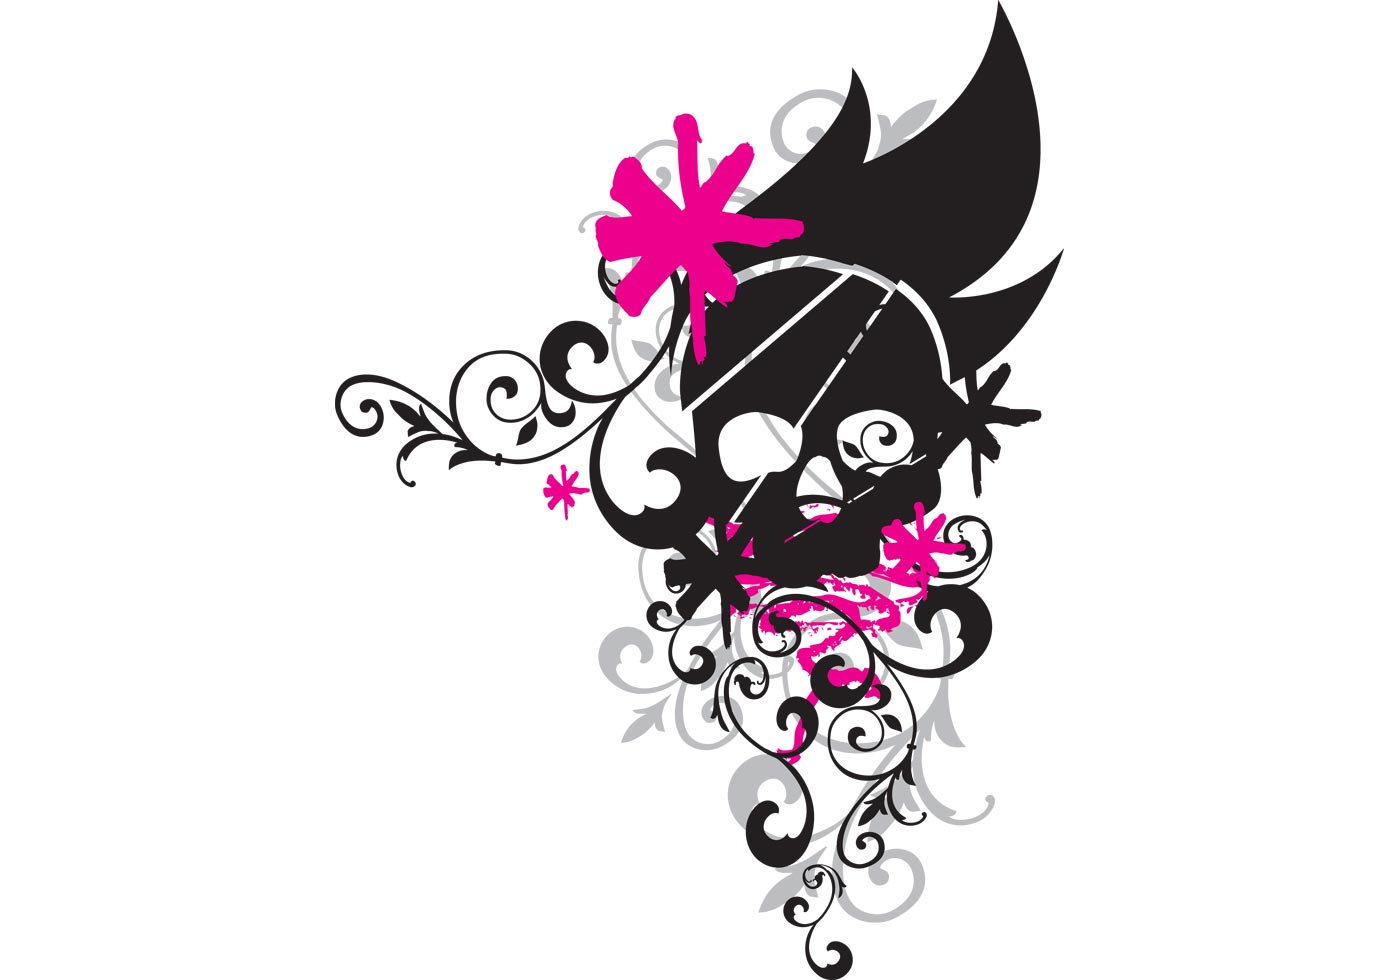 Flower Skull Download Free Vector Art Stock Graphics &